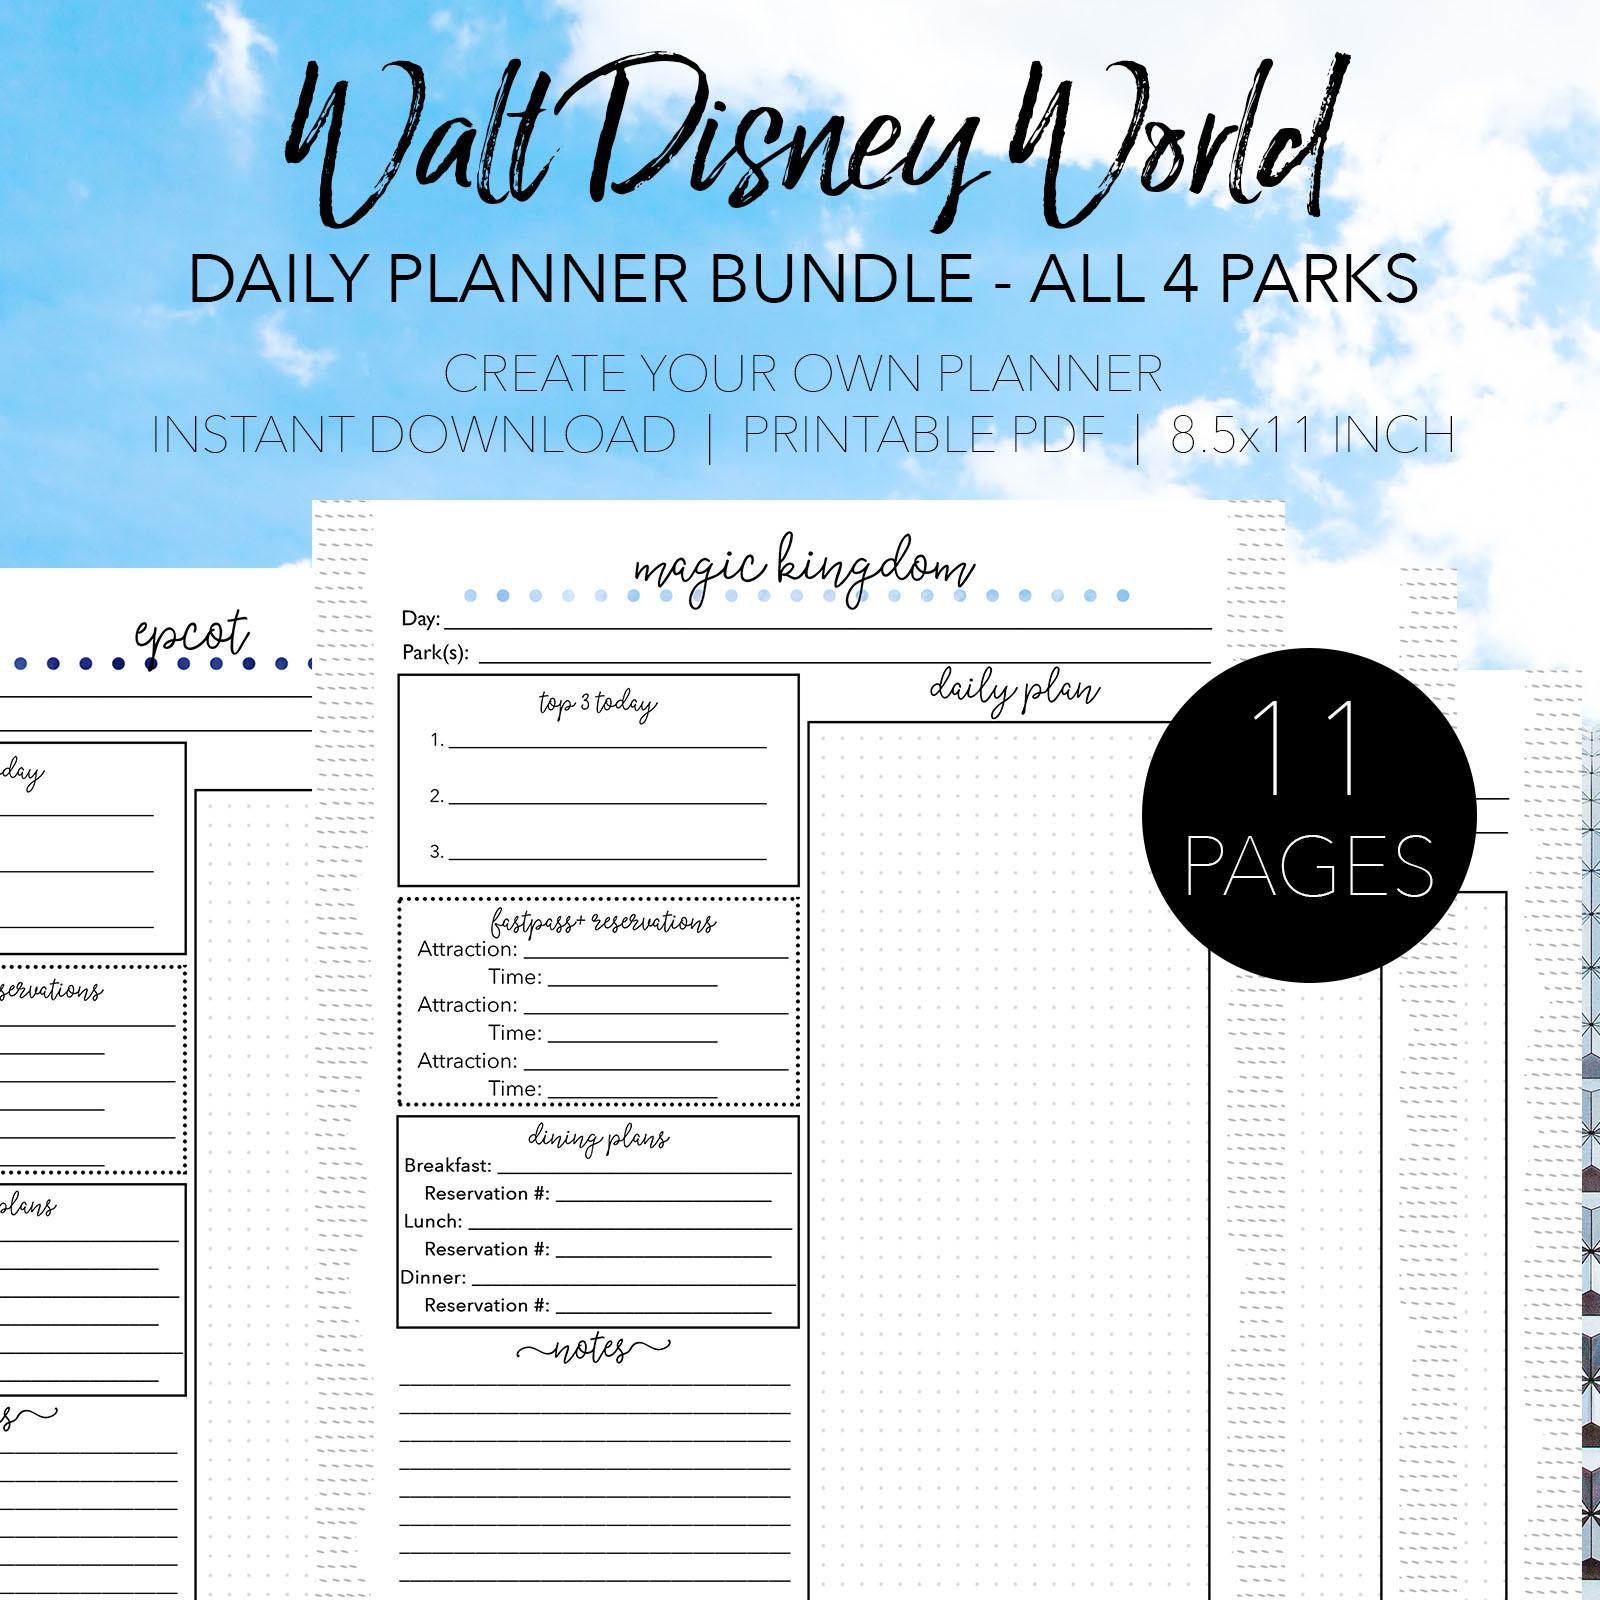 Printable List Of Rides At Disney World 2020 Checklist  Printable List Of Disney World Rides 2021